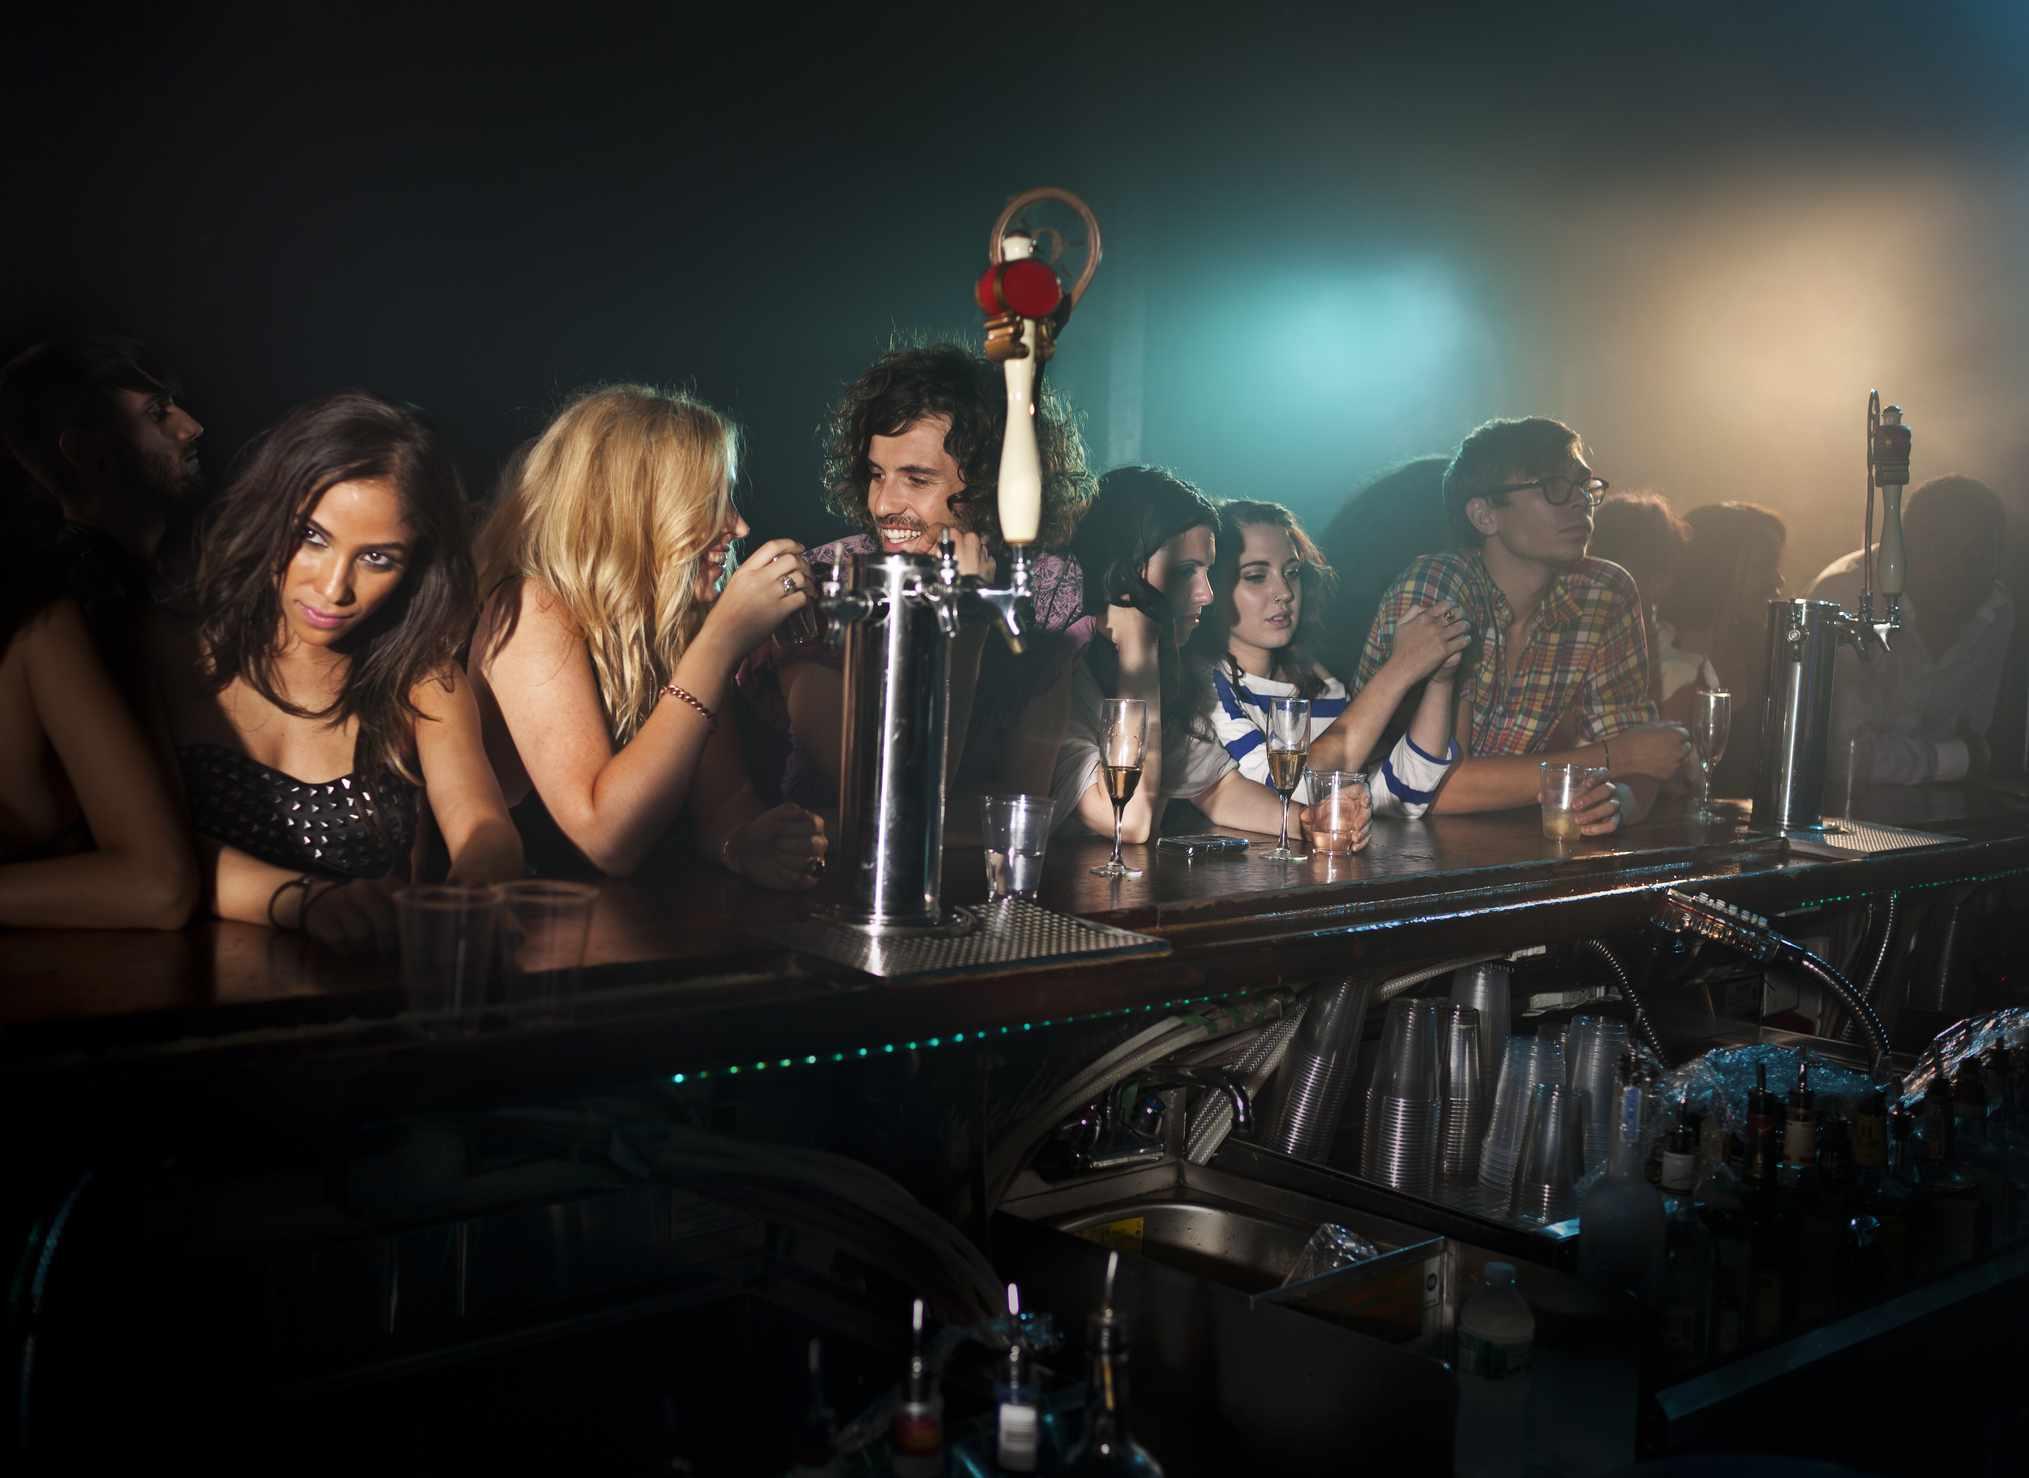 New York City nightclub